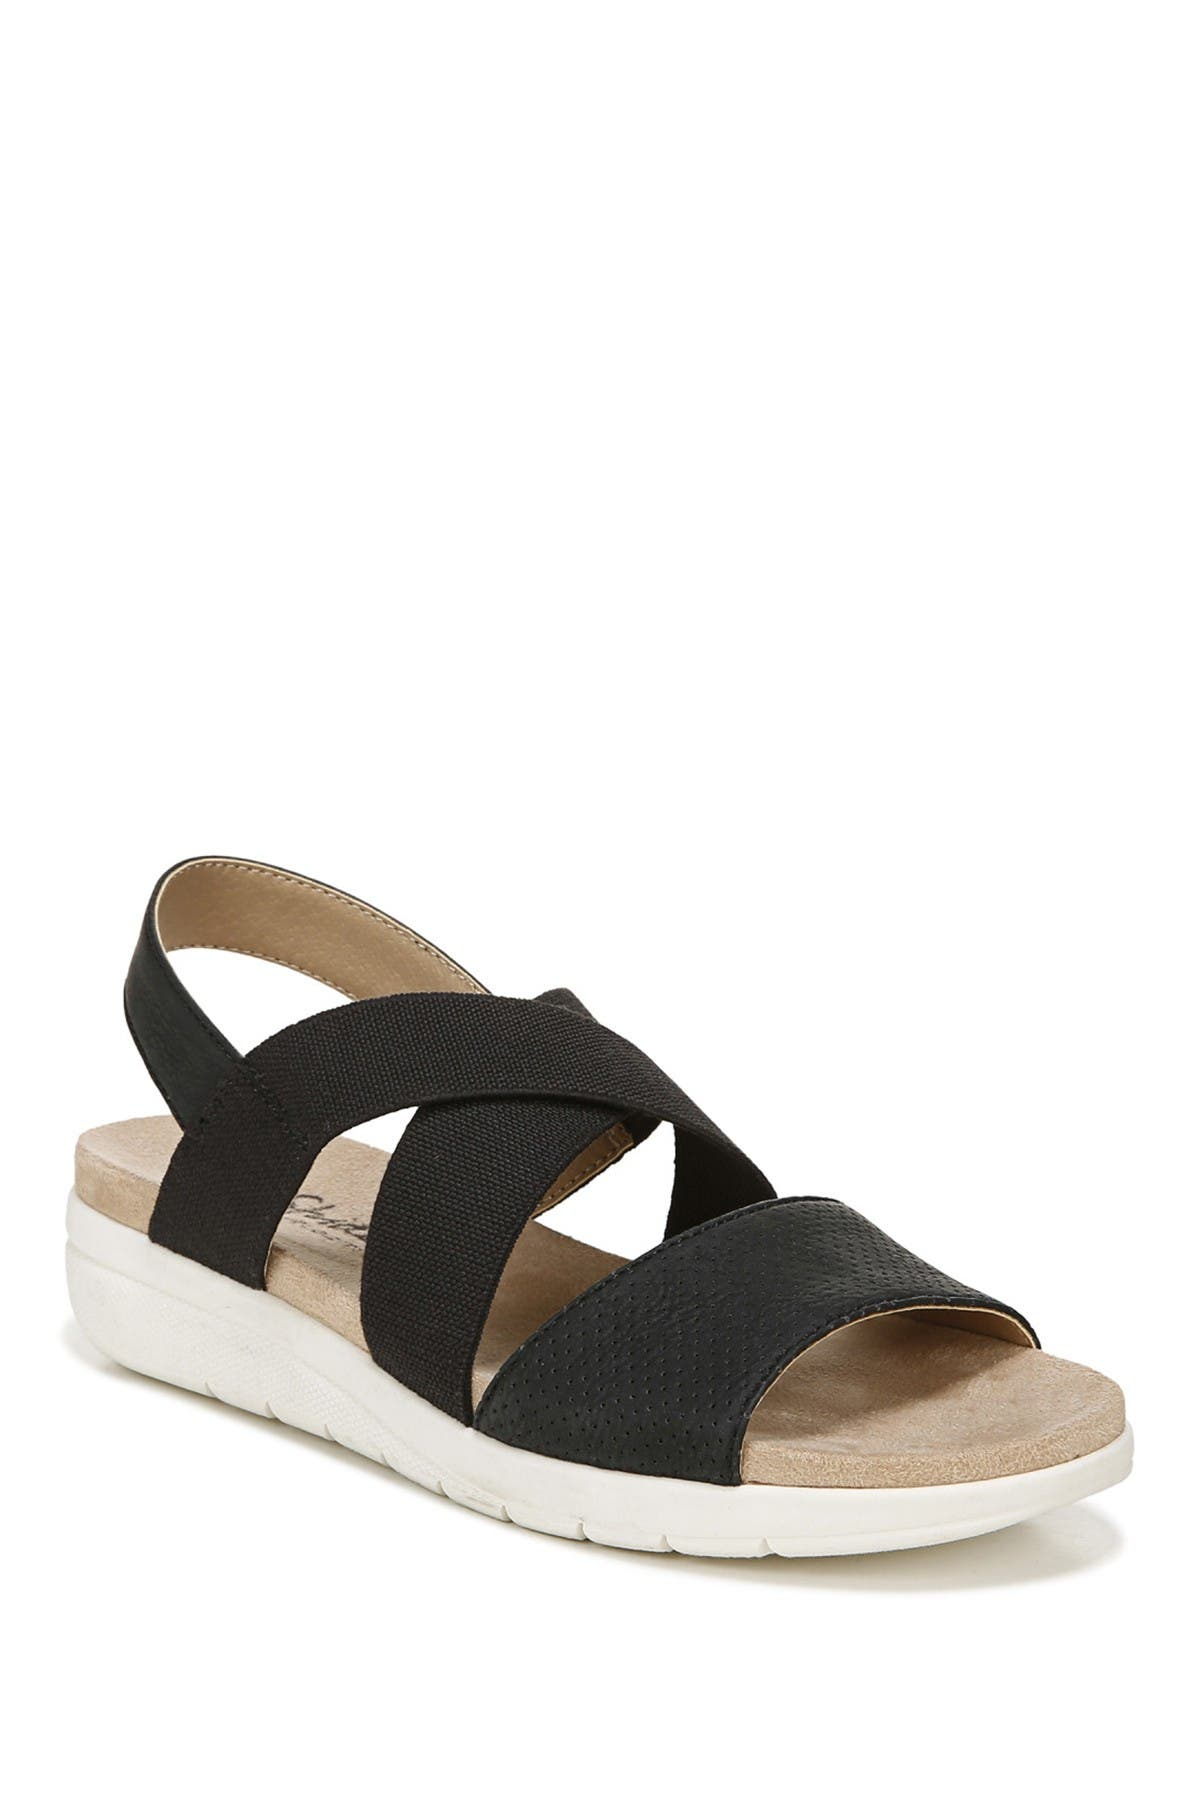 Image of LifeStride Plush Sandal